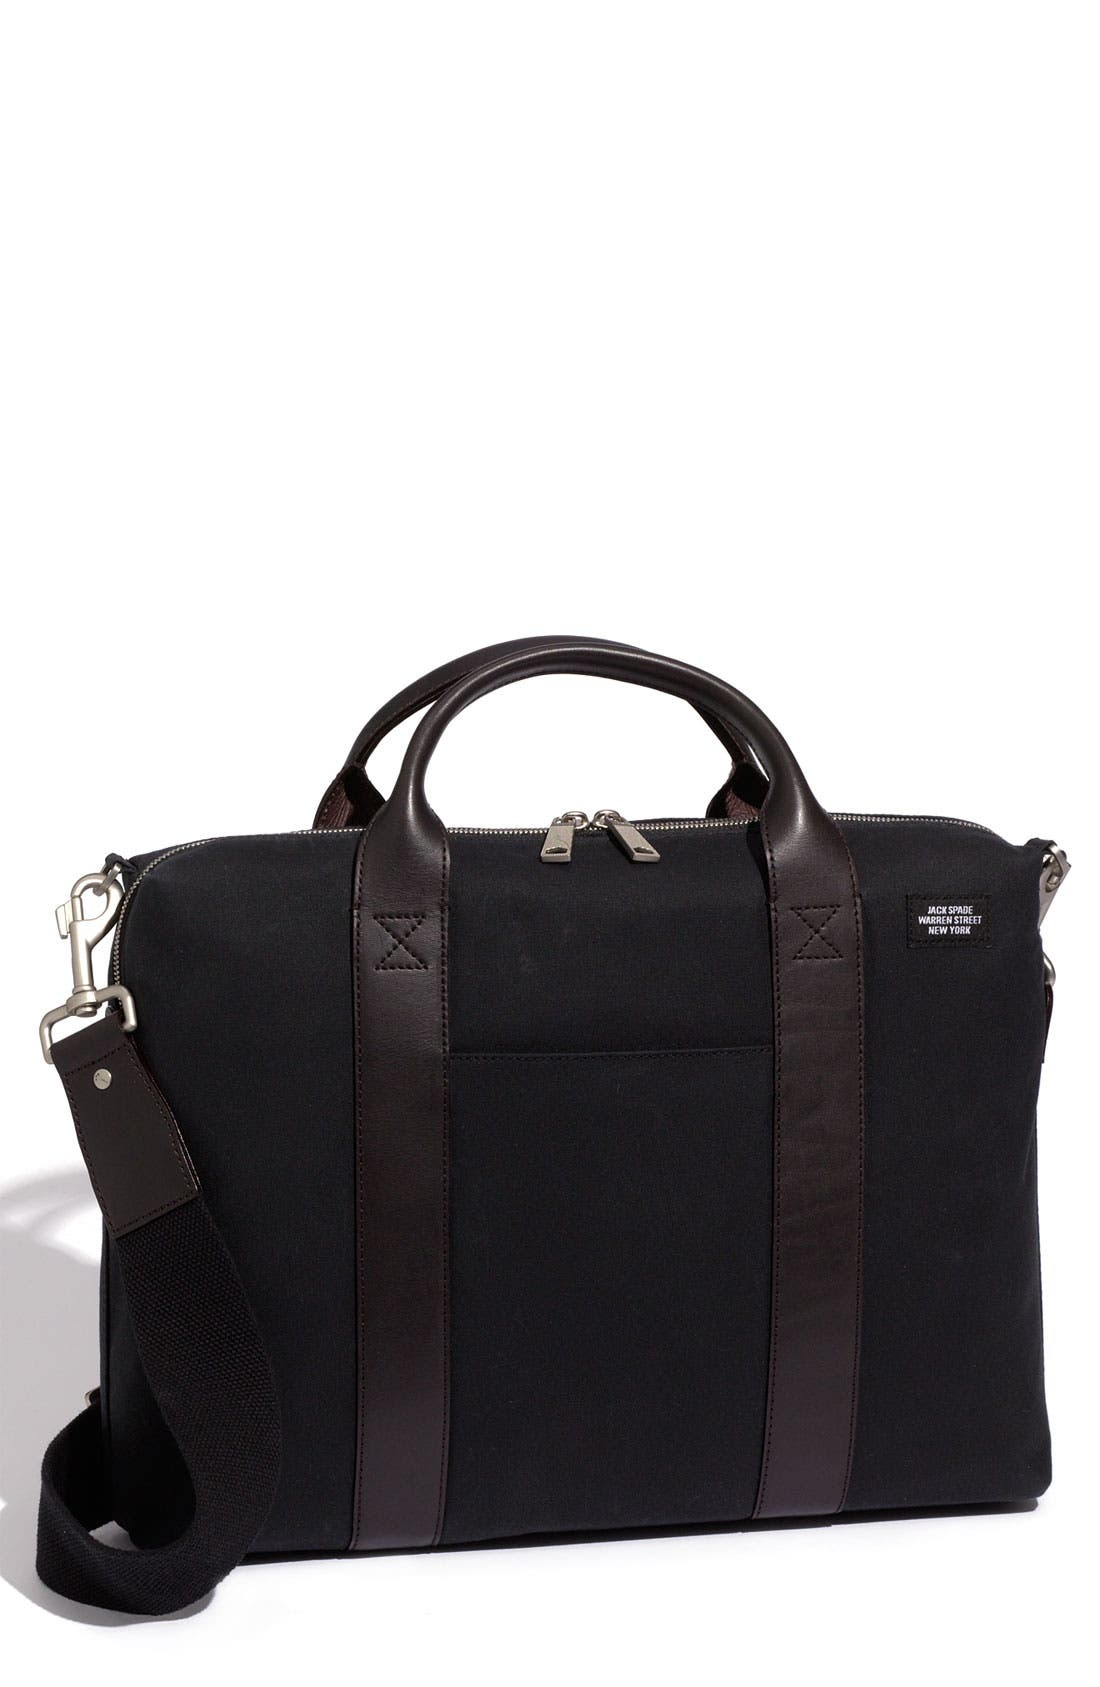 Alternate Image 1 Selected - Jack Spade 'Davis' Briefcase